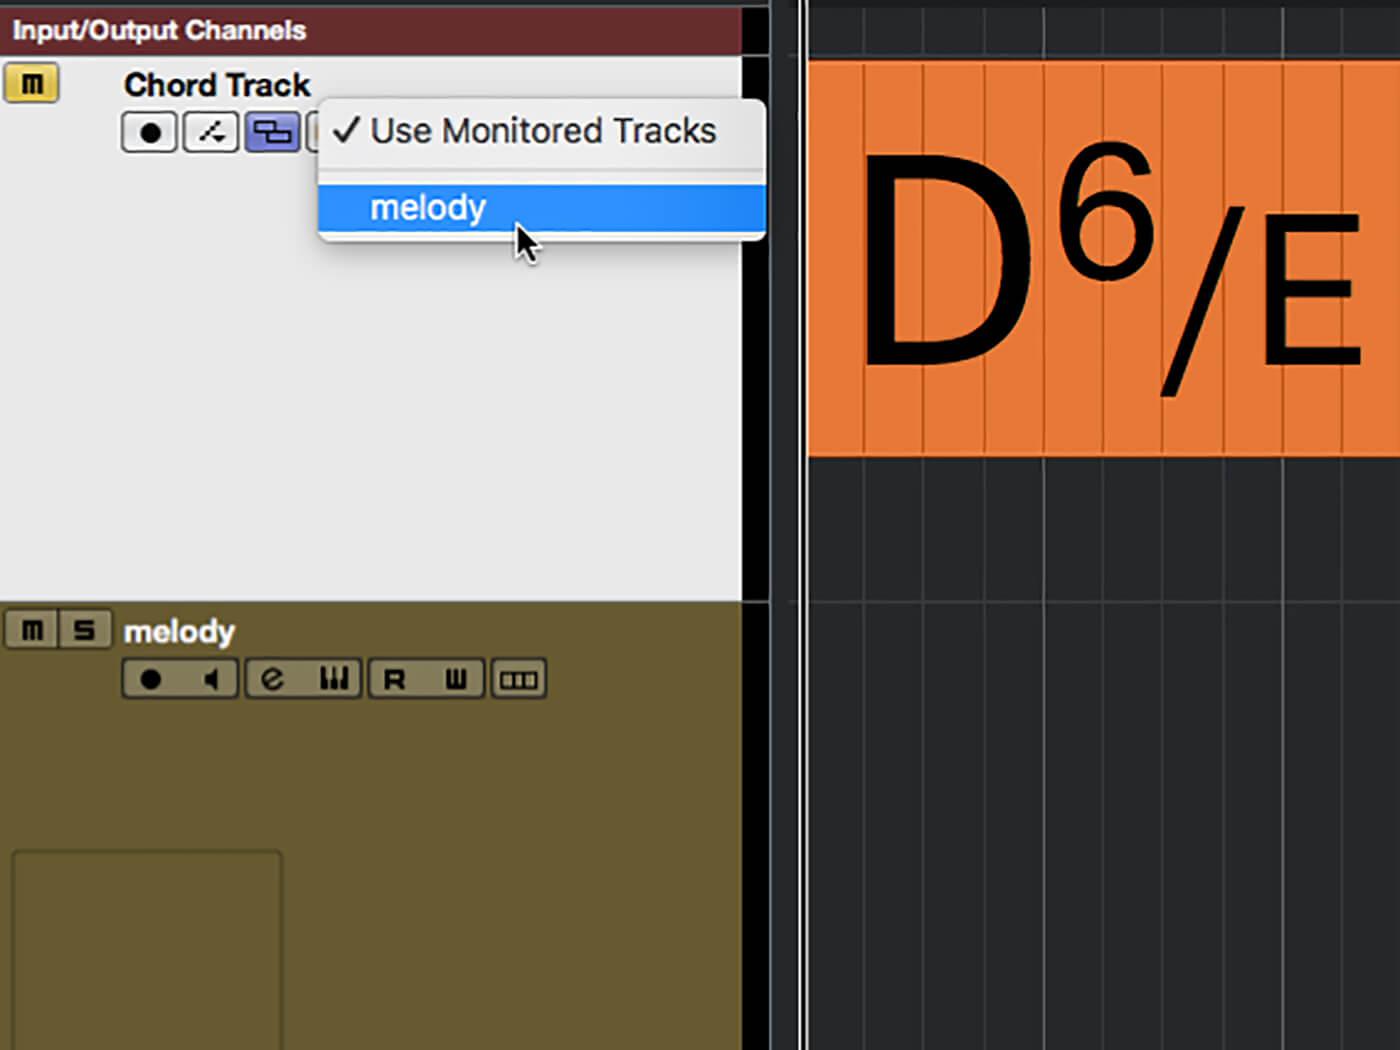 MT 205 Cubase Score Editor Step 5